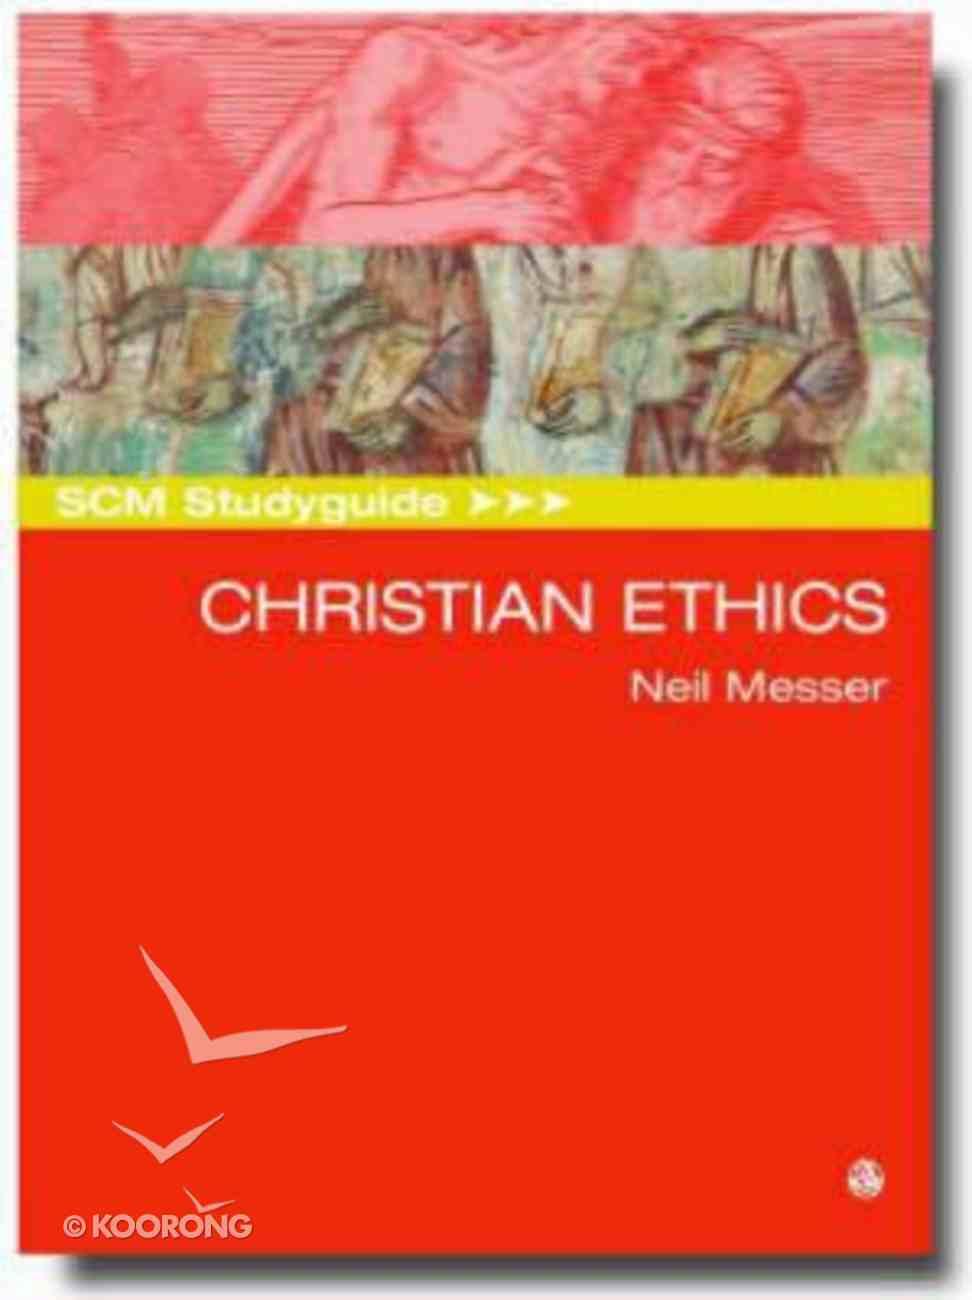 Scm Study Guide: Christian Ethics (Scm Studyguide Series) Paperback